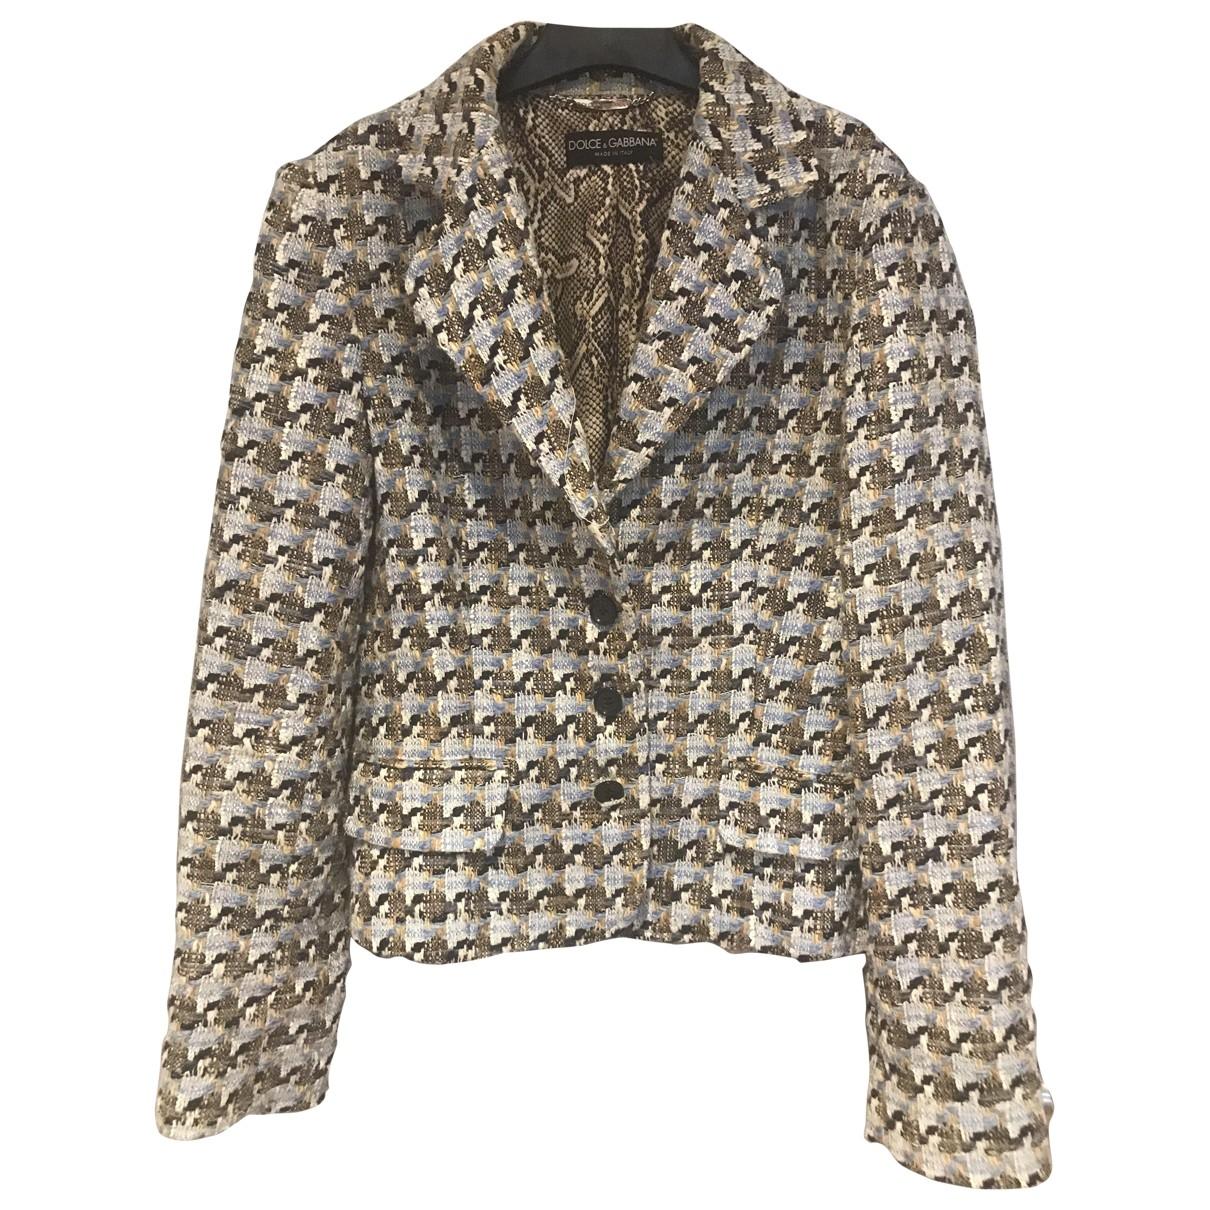 Dolce & Gabbana \N Jacke in  Bunt Baumwolle